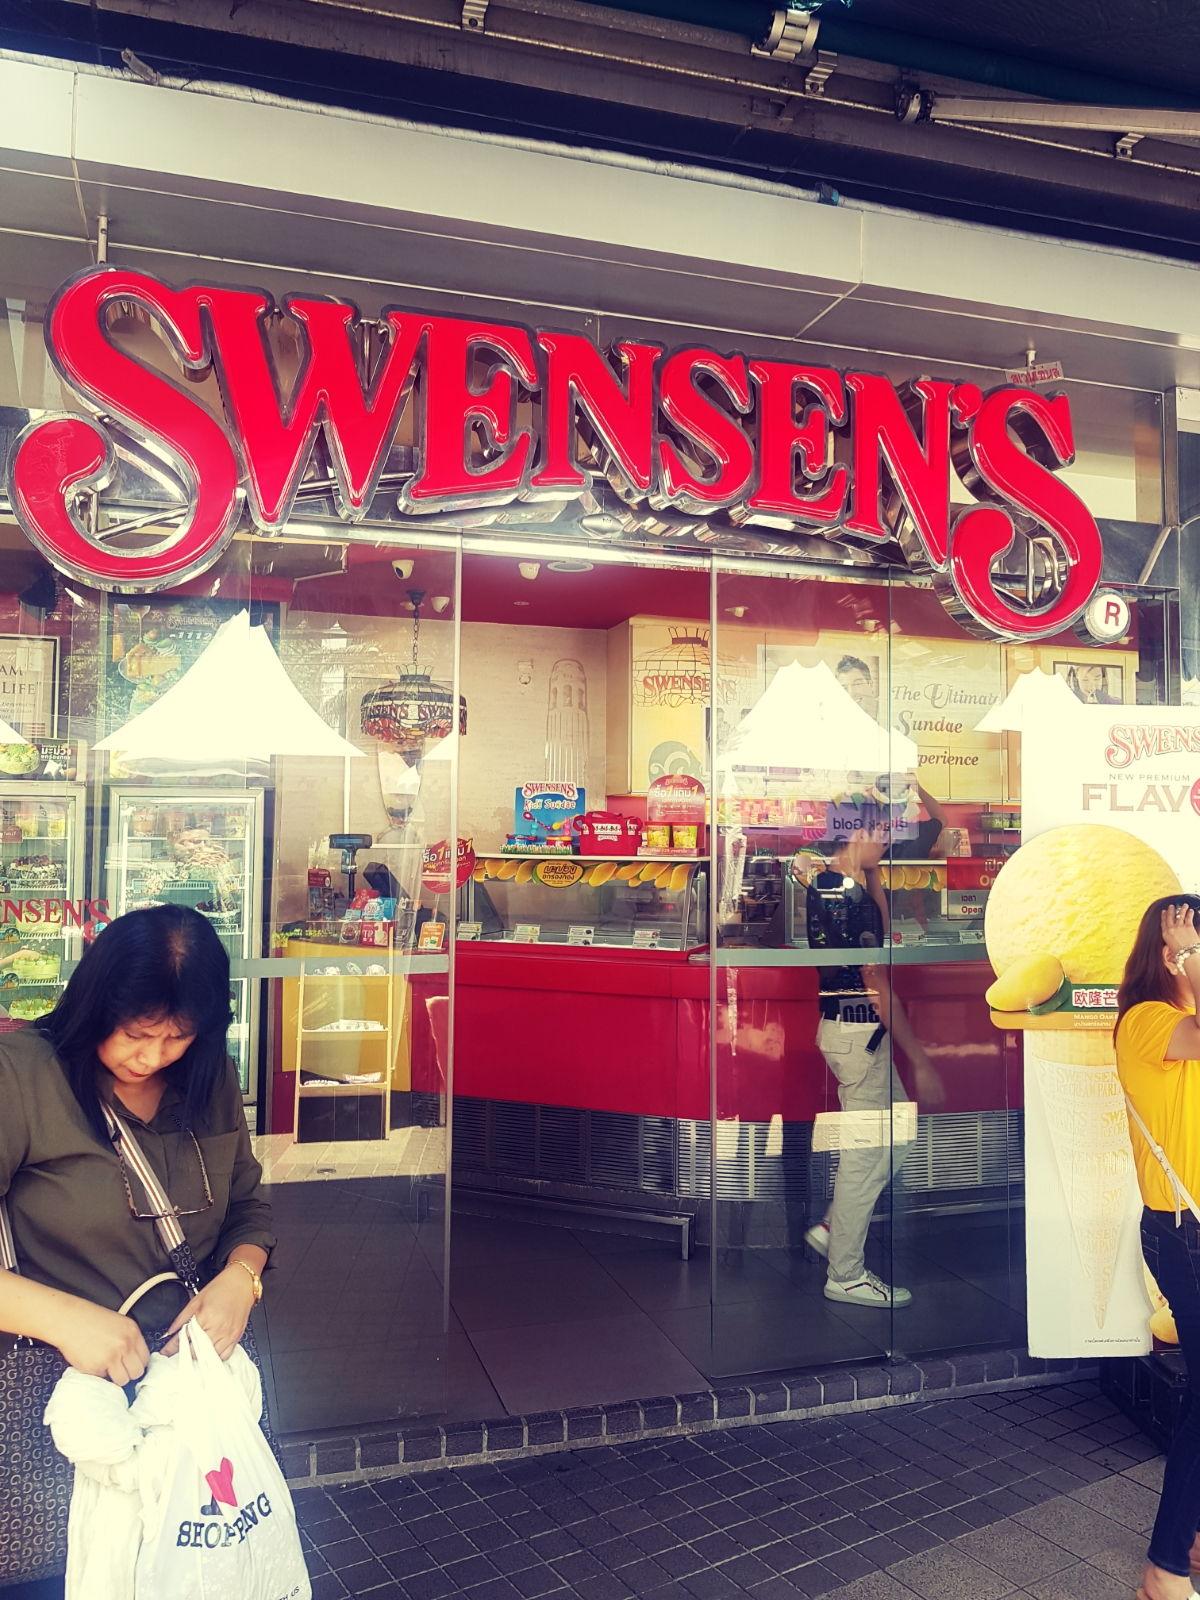 Swensens Ice Cream Parlour, Bangkok, Thailand